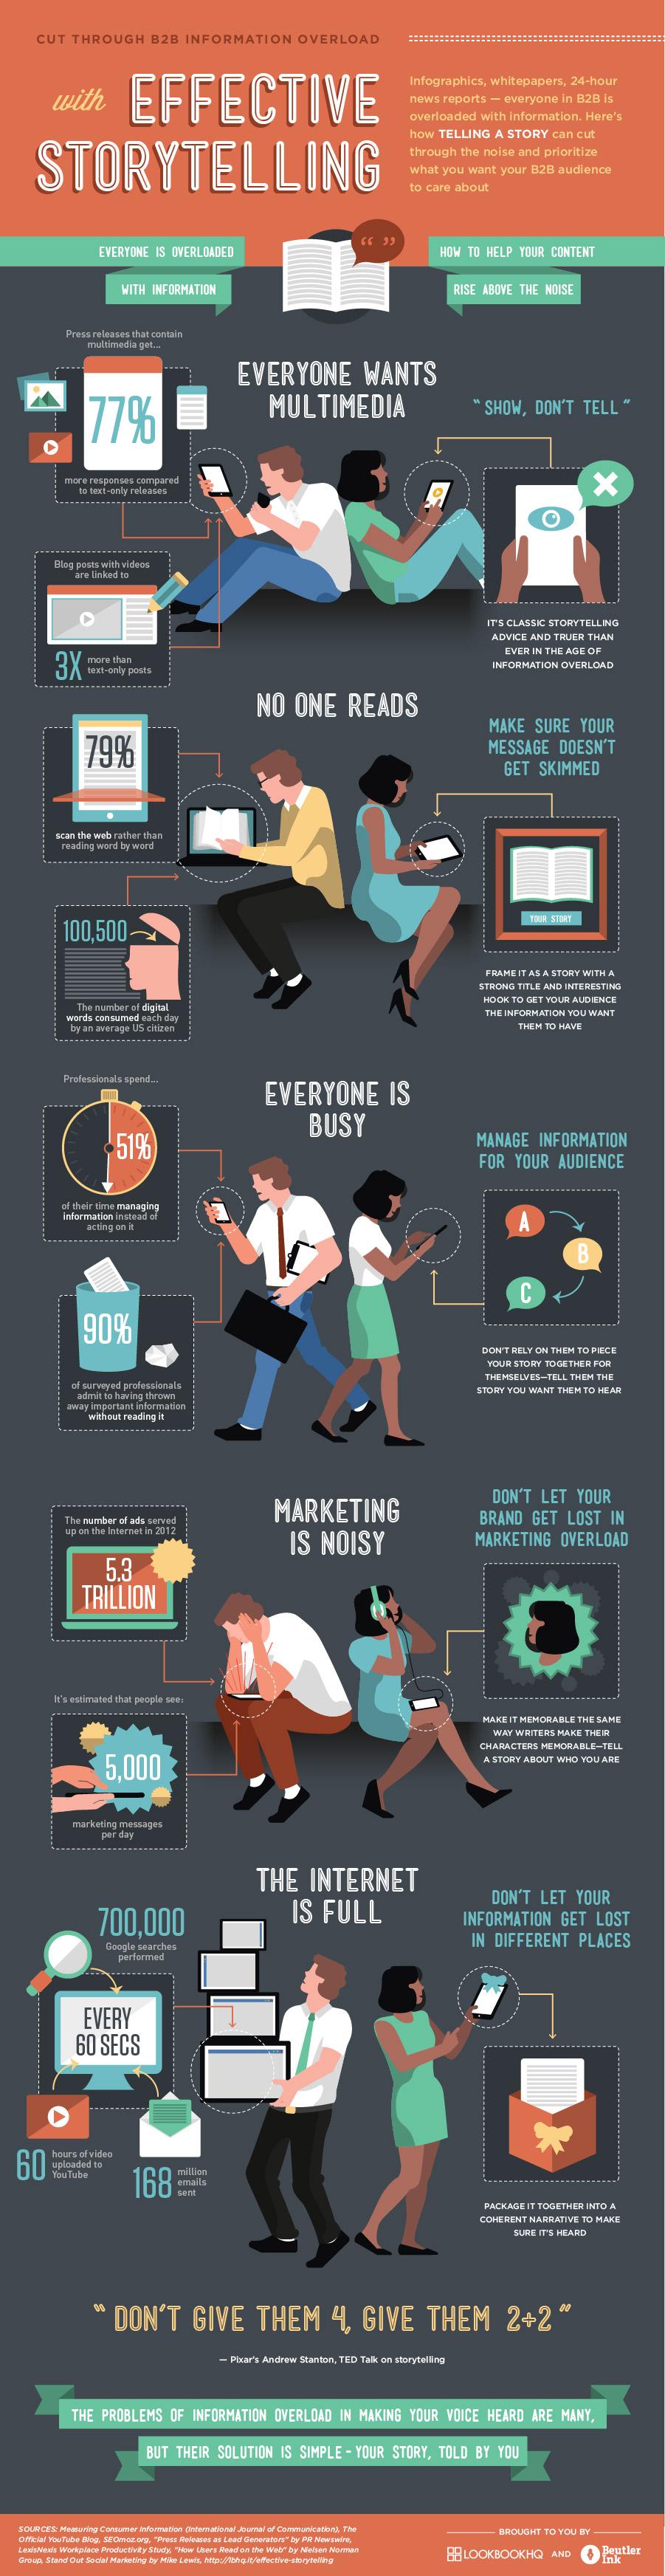 storytelling_infographic